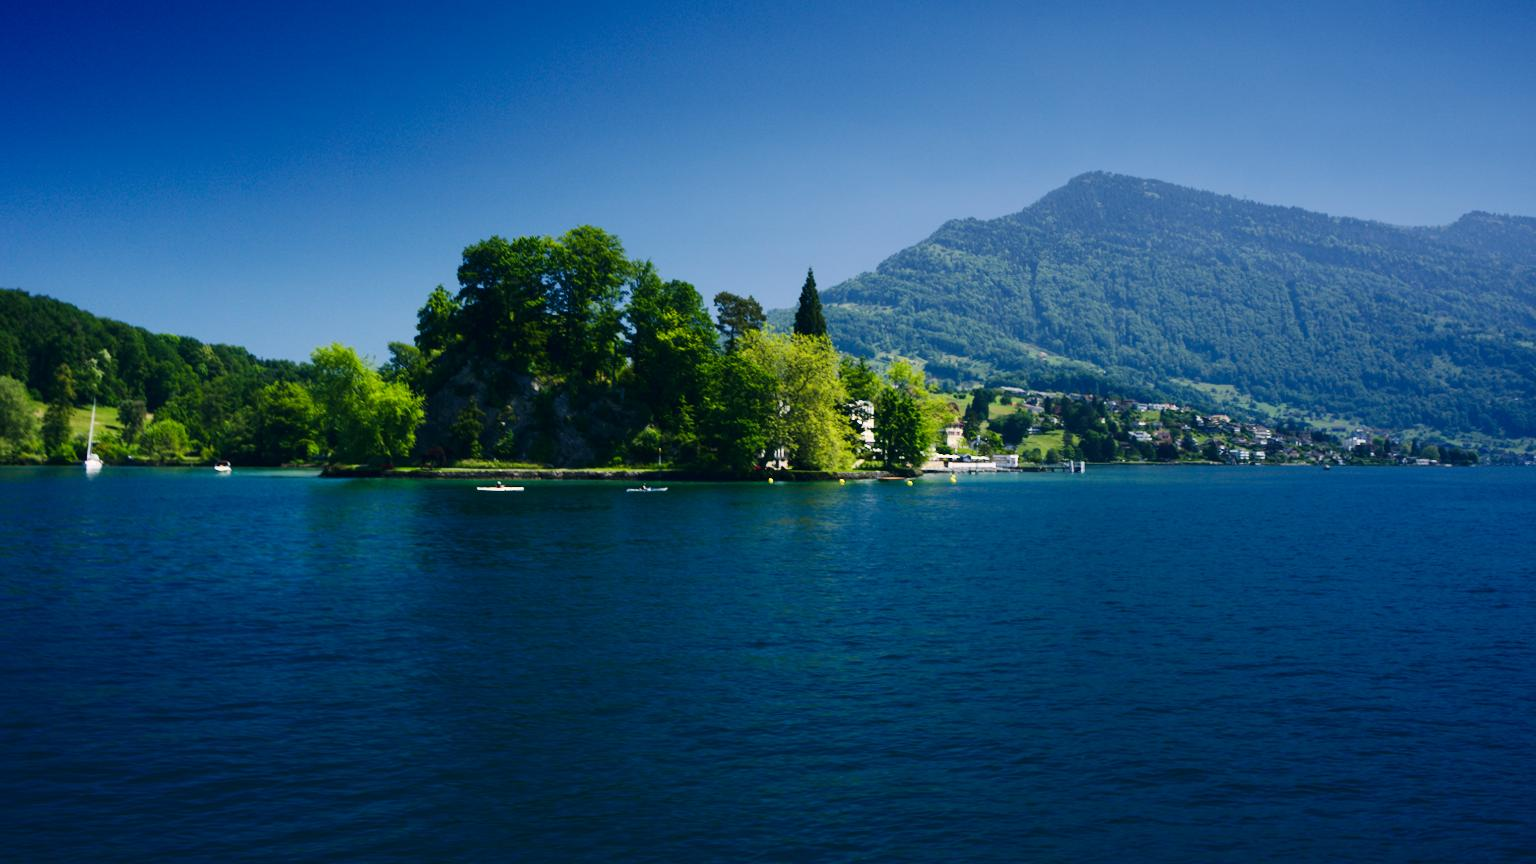 {filename}/img/luzern-jezera-2.jpg